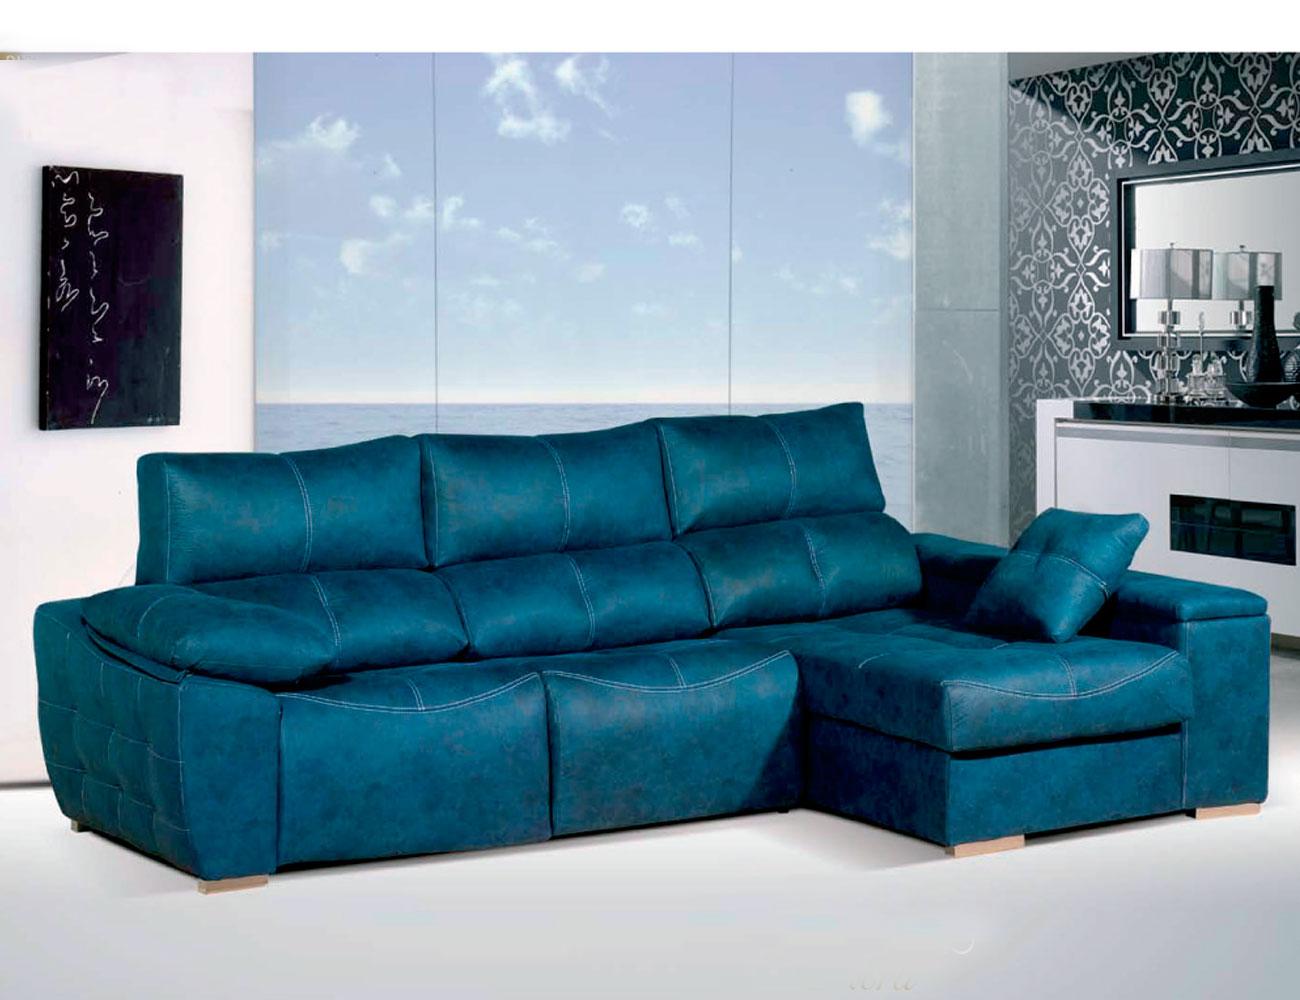 Sofa chaiselongue relax 2 motores anti manchas turquesa32